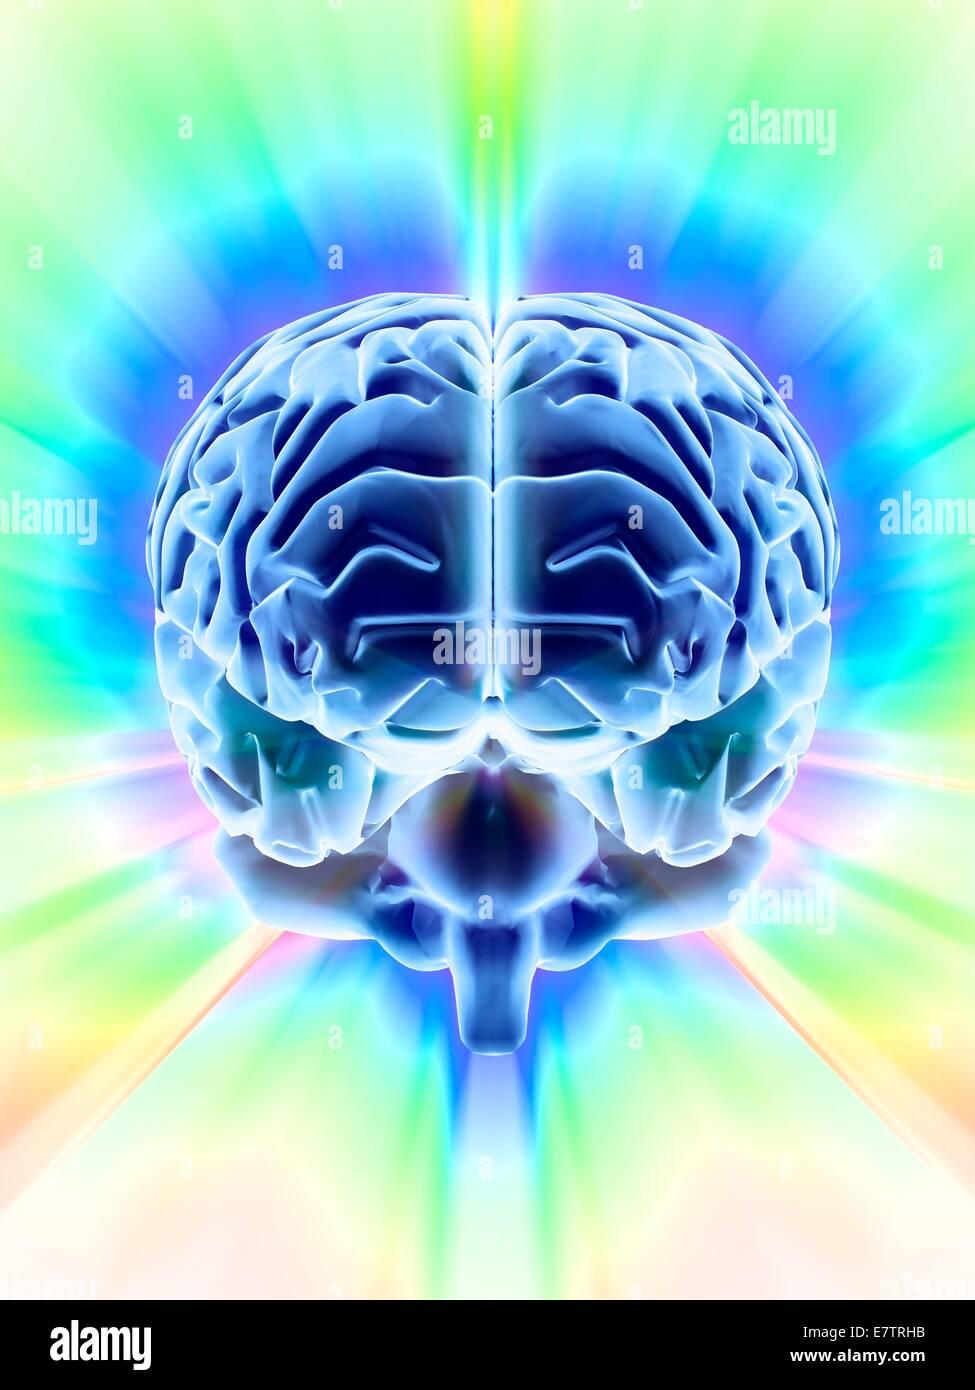 Human brain, computer artwork. - Stock Image